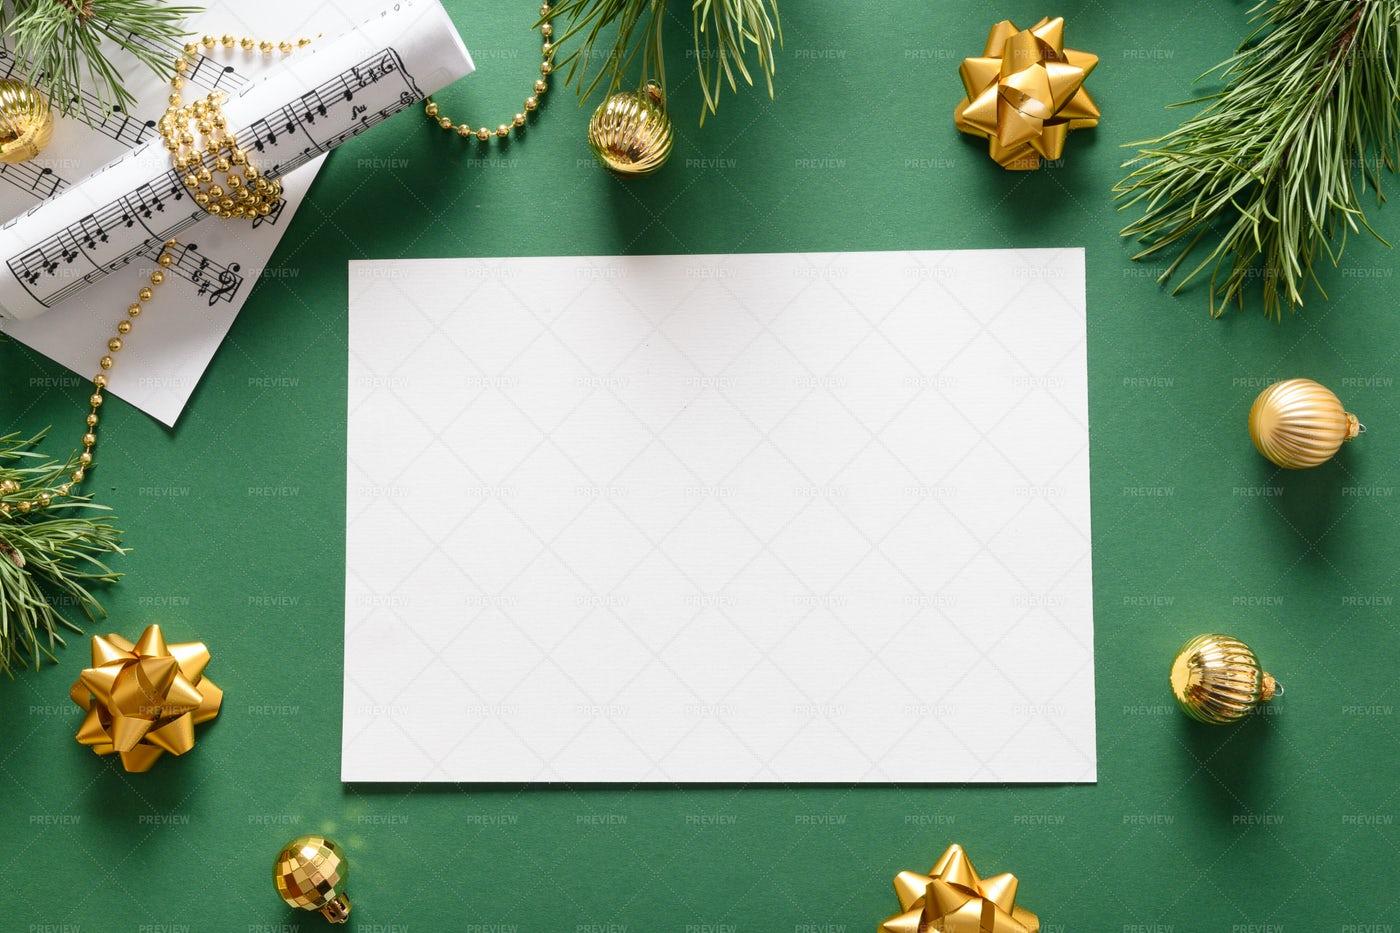 Music Blank For Christmas Carols: Stock Photos